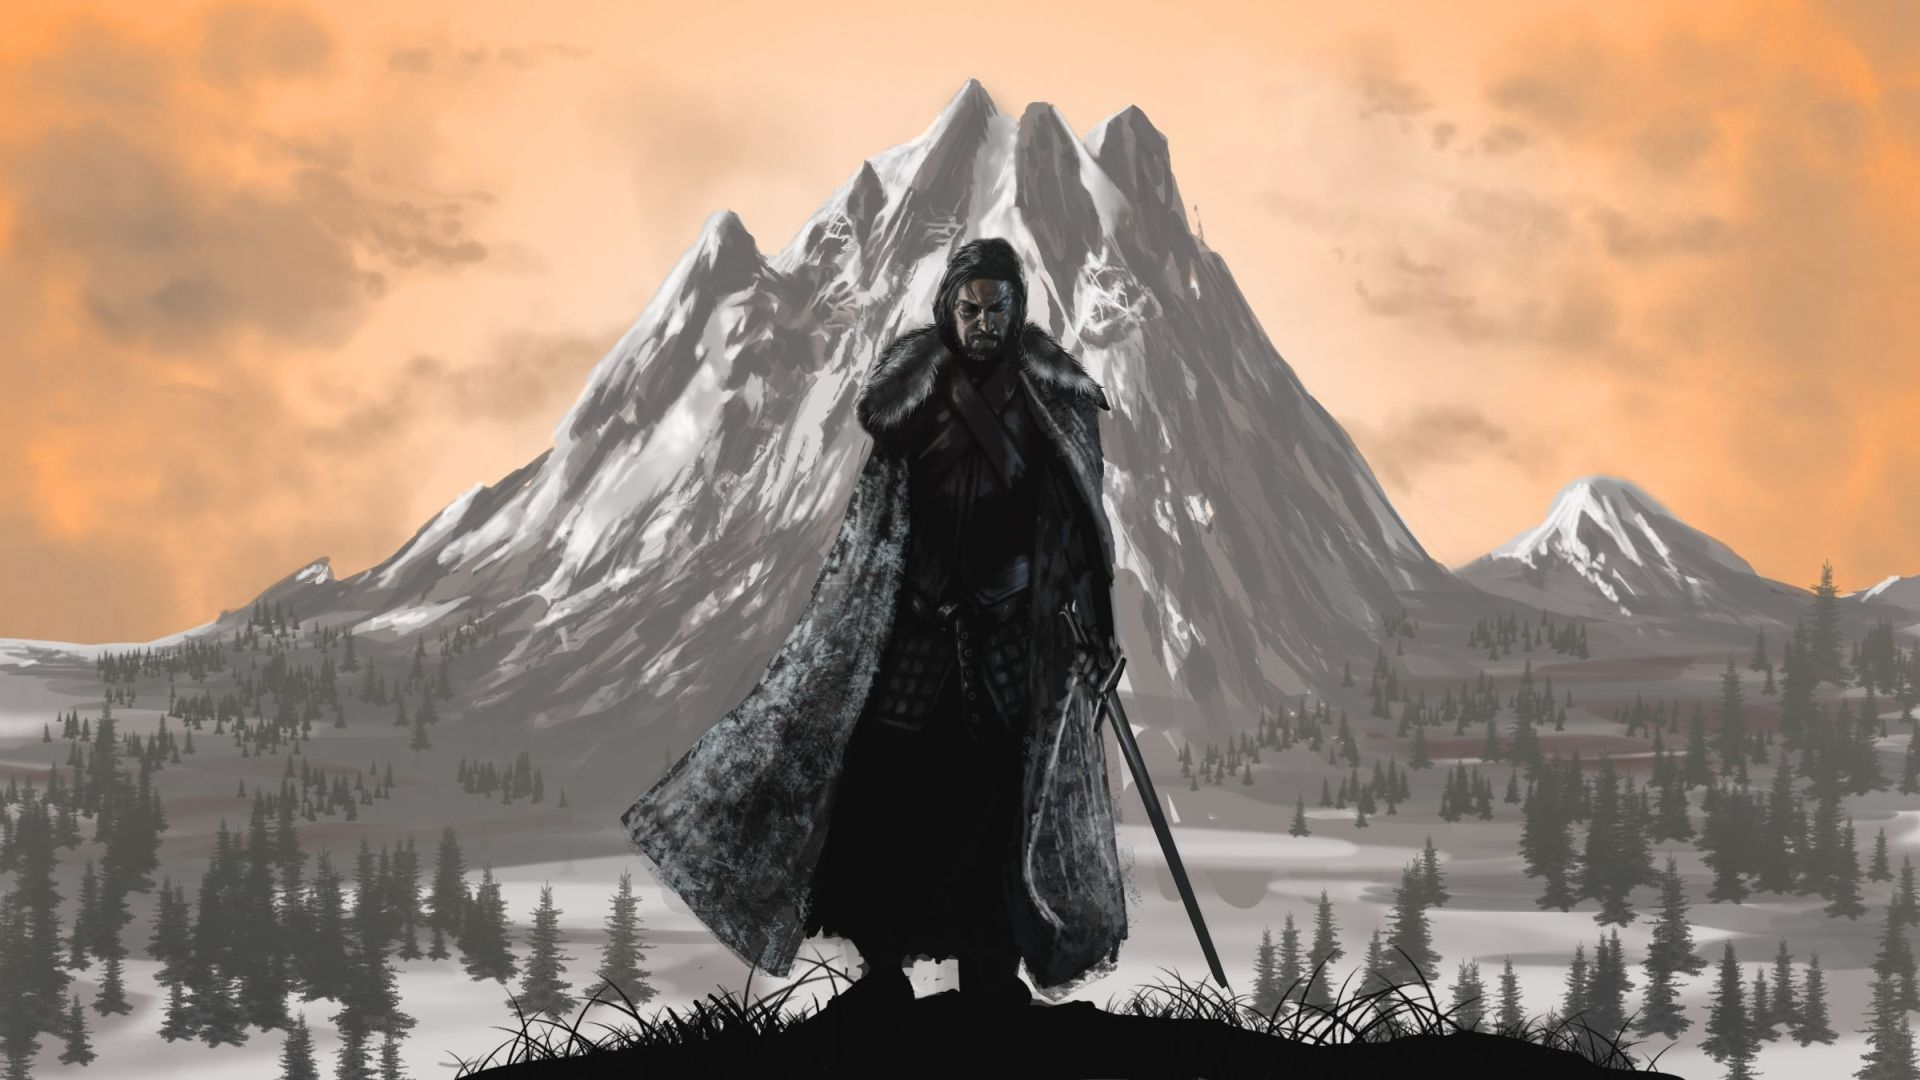 Game of Thrones Daenerys Tmountain and women fan art